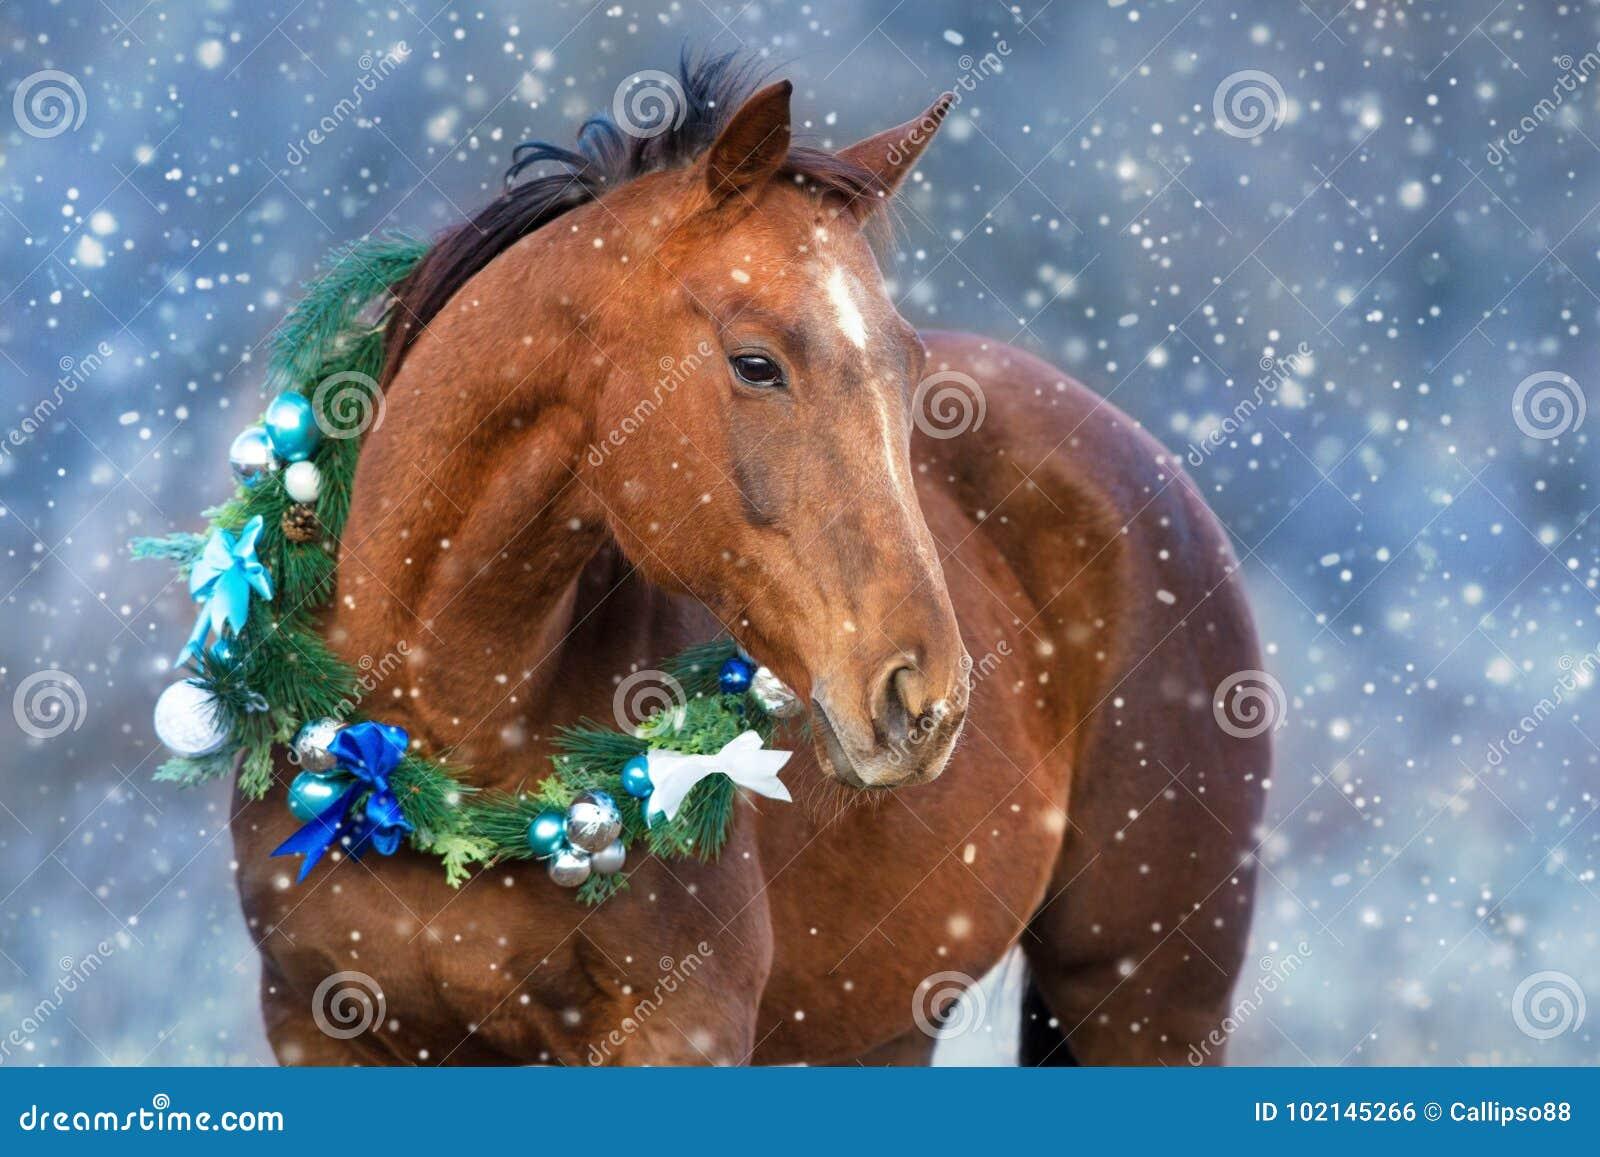 Horse in christmas wreath